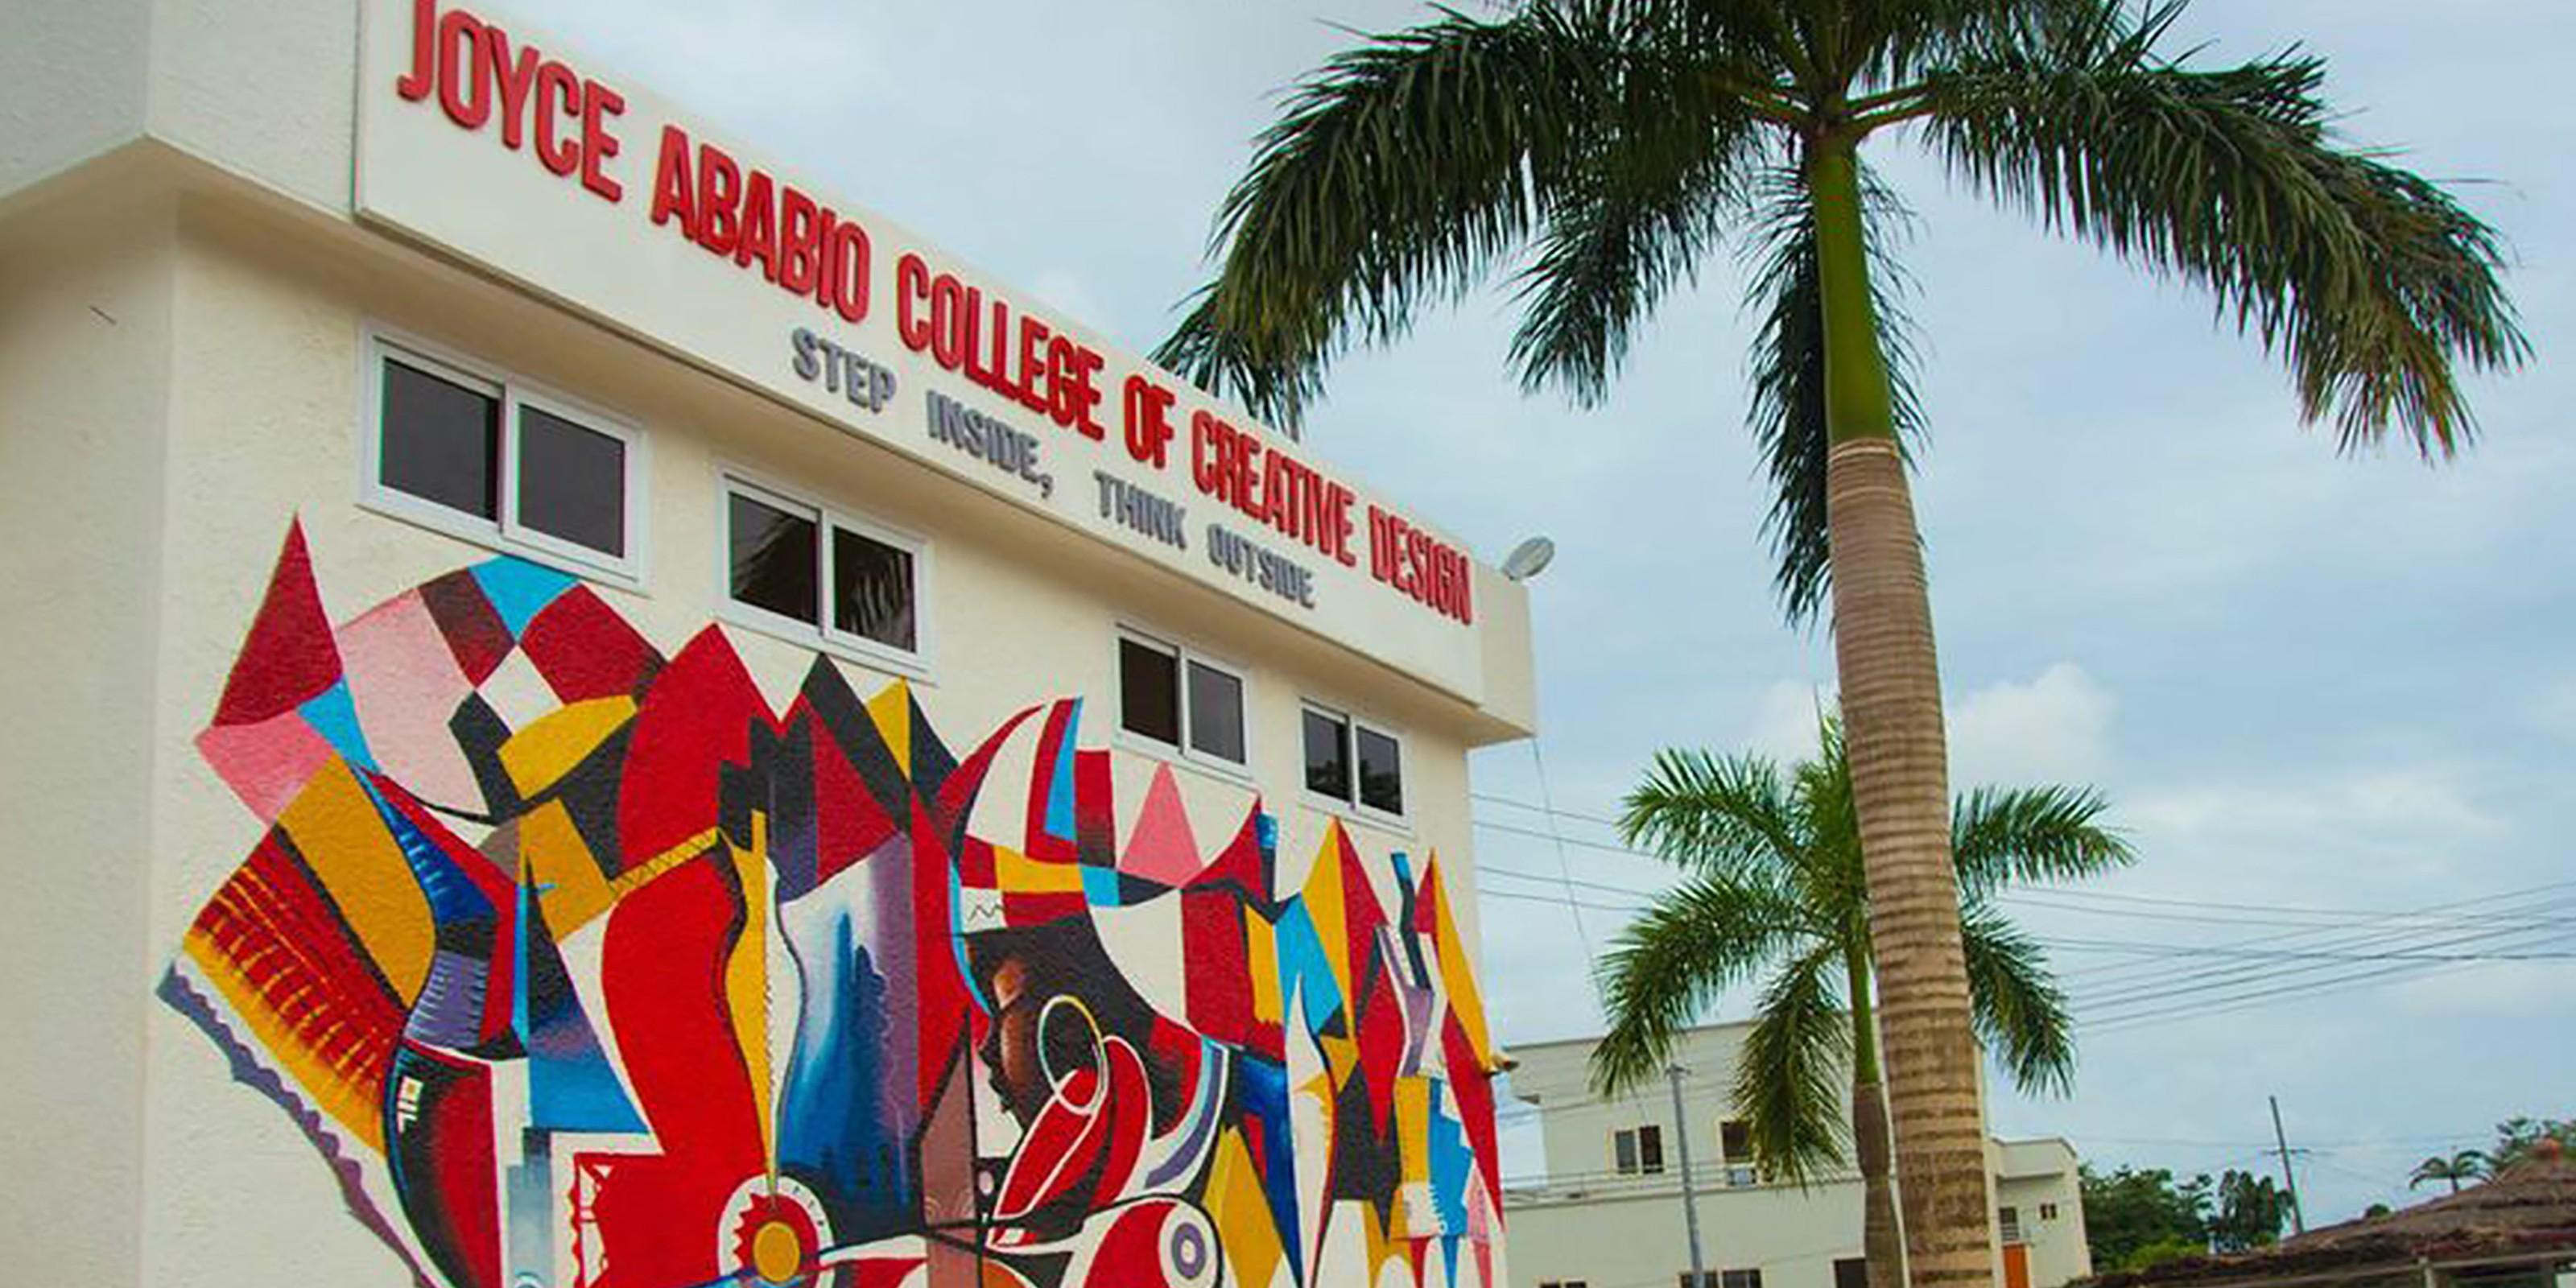 Joyce Ababio College Of Creative Design Jaccd Linkedin